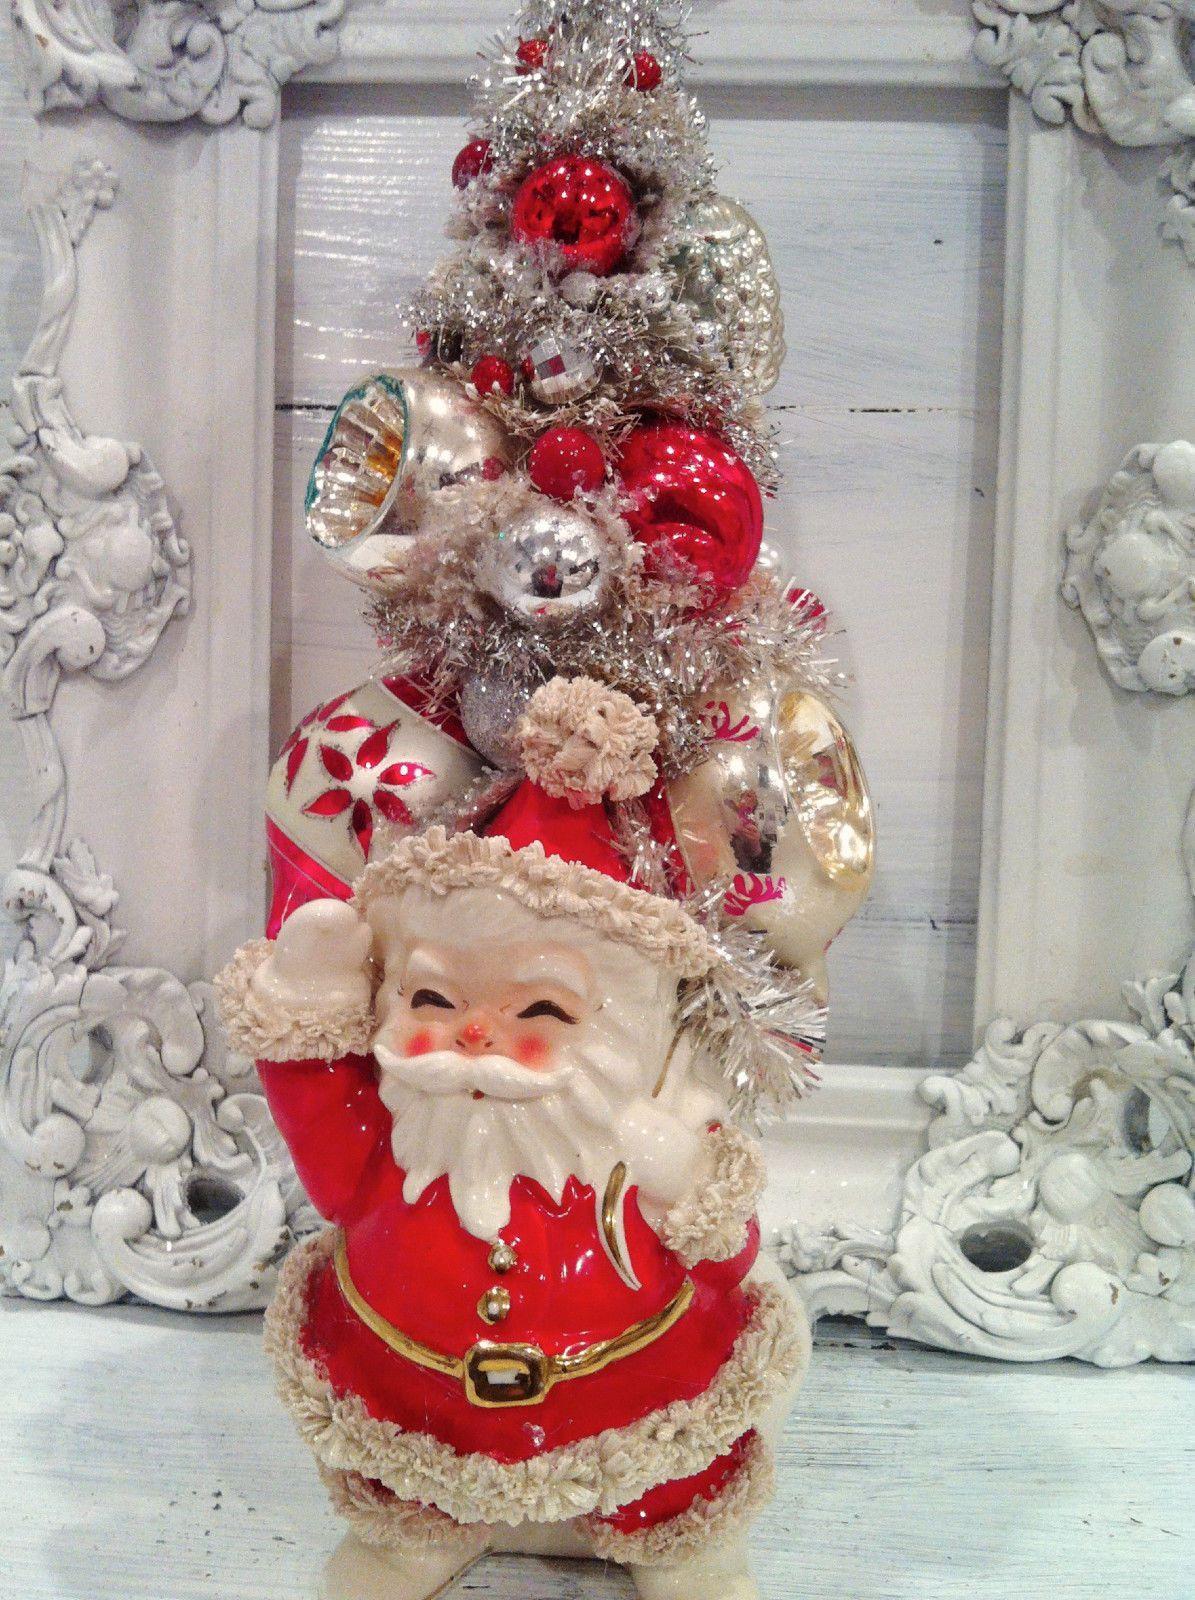 Vintage Spaghetti Santa Christmas Bottle Brush Tree Vintage Christmas Crafts Retro Christmas Decorations Vintage Christmas Ornaments